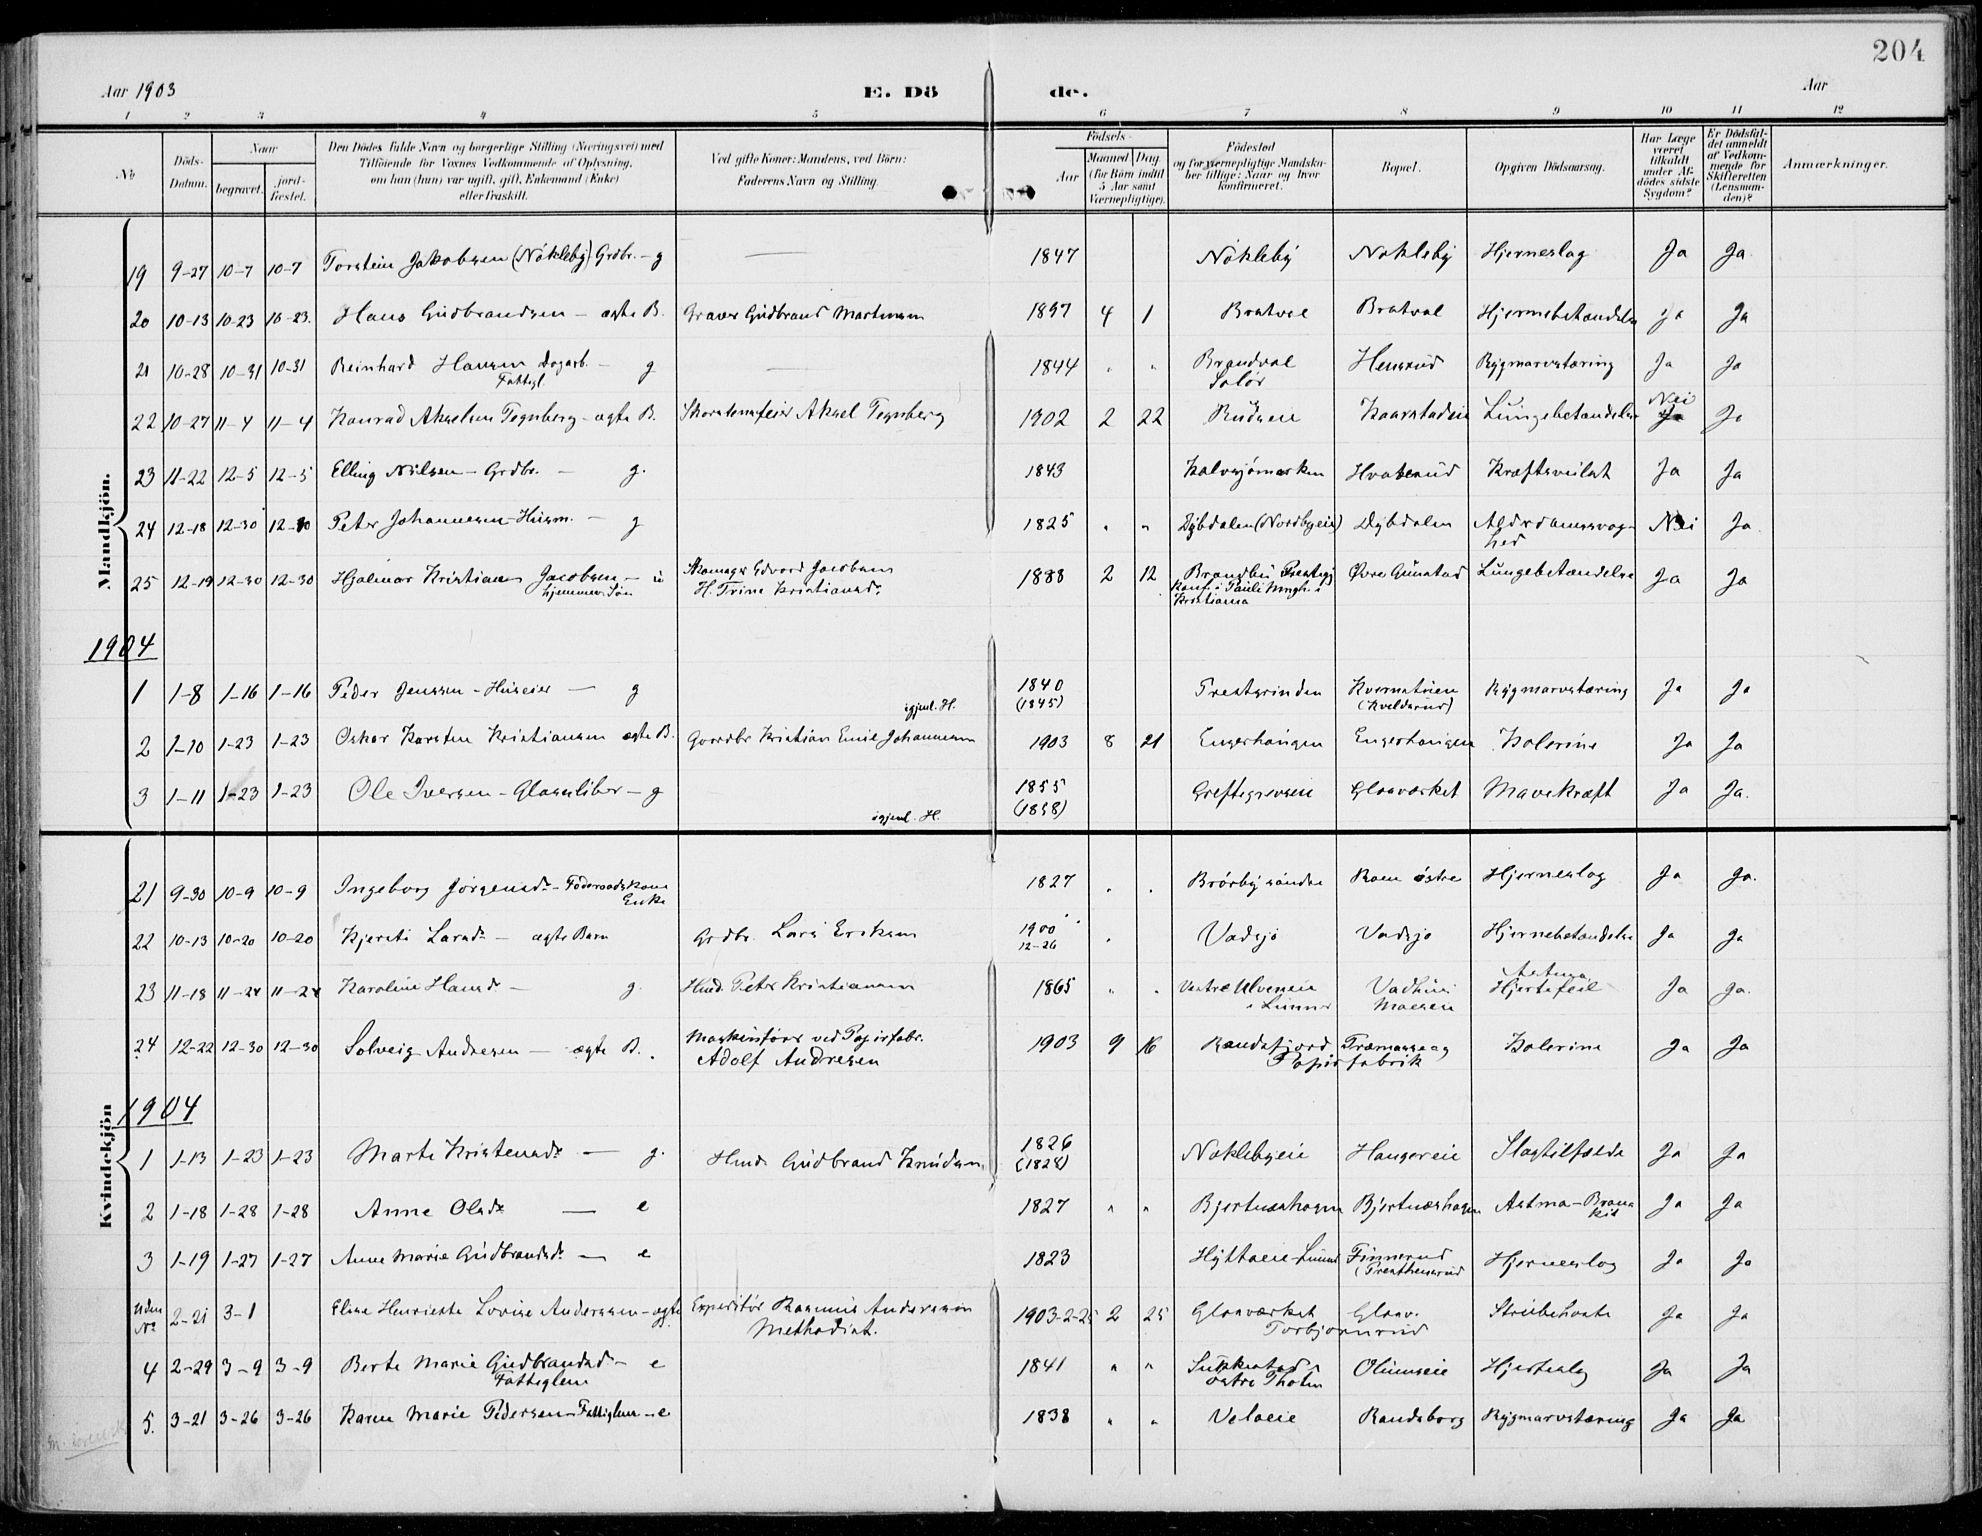 SAH, Jevnaker prestekontor, Ministerialbok nr. 11, 1902-1913, s. 204